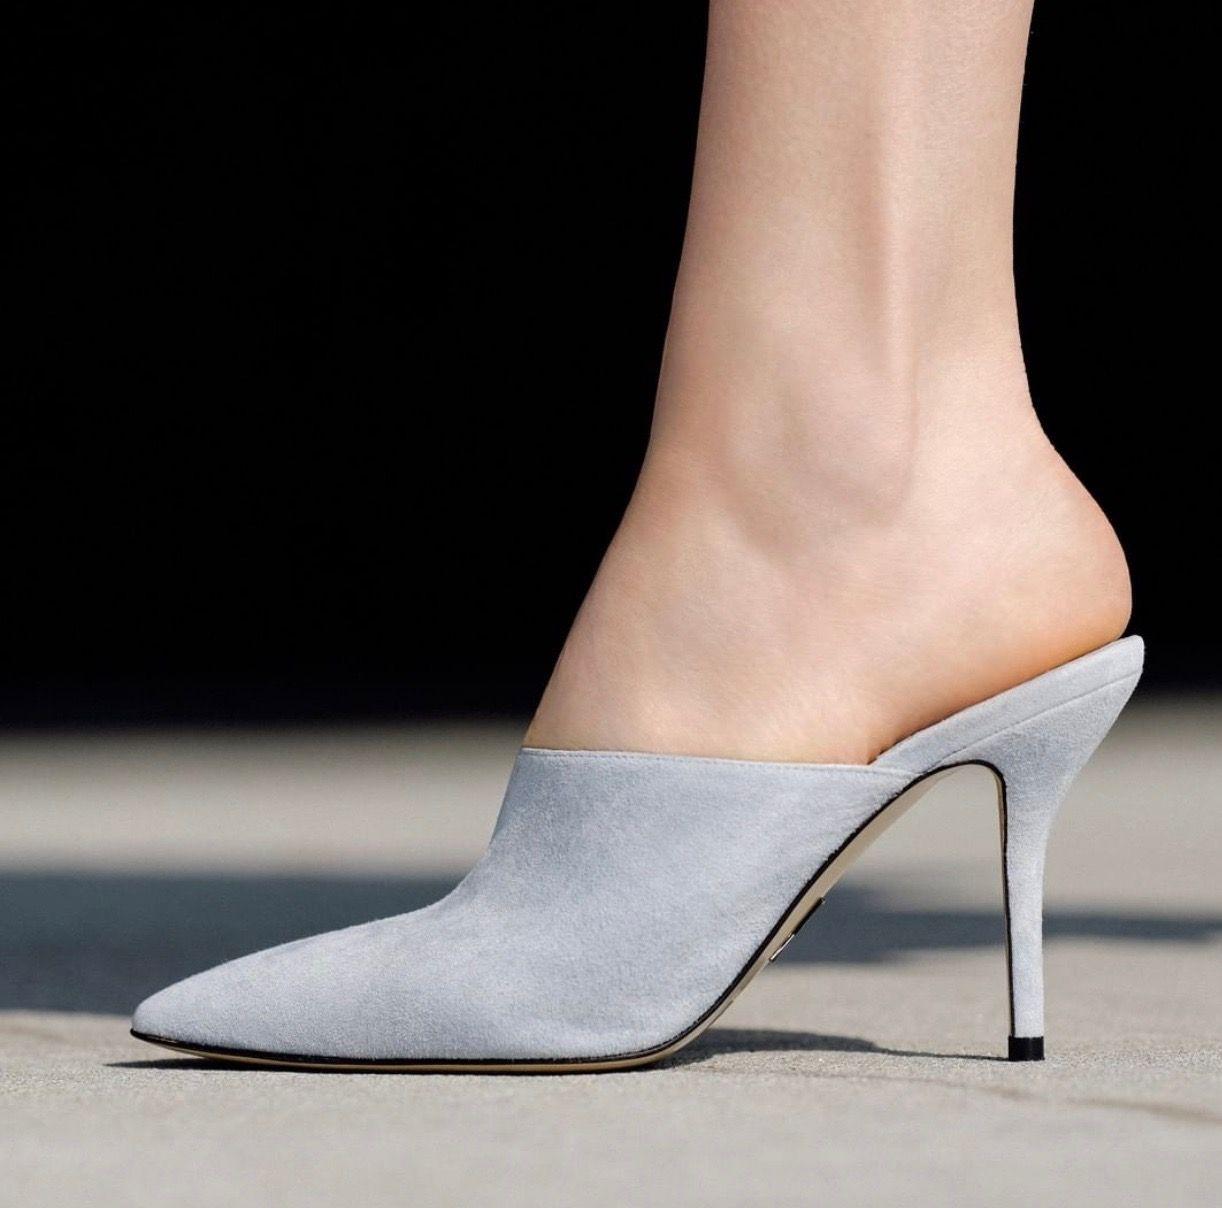 Paul Andrew Stiletto 2019 Shoes Shoesaddict Sandals Zapatos Estilo Fashion Style Vanessacrestto Stiletto Heels Shoes Fashion Shoes